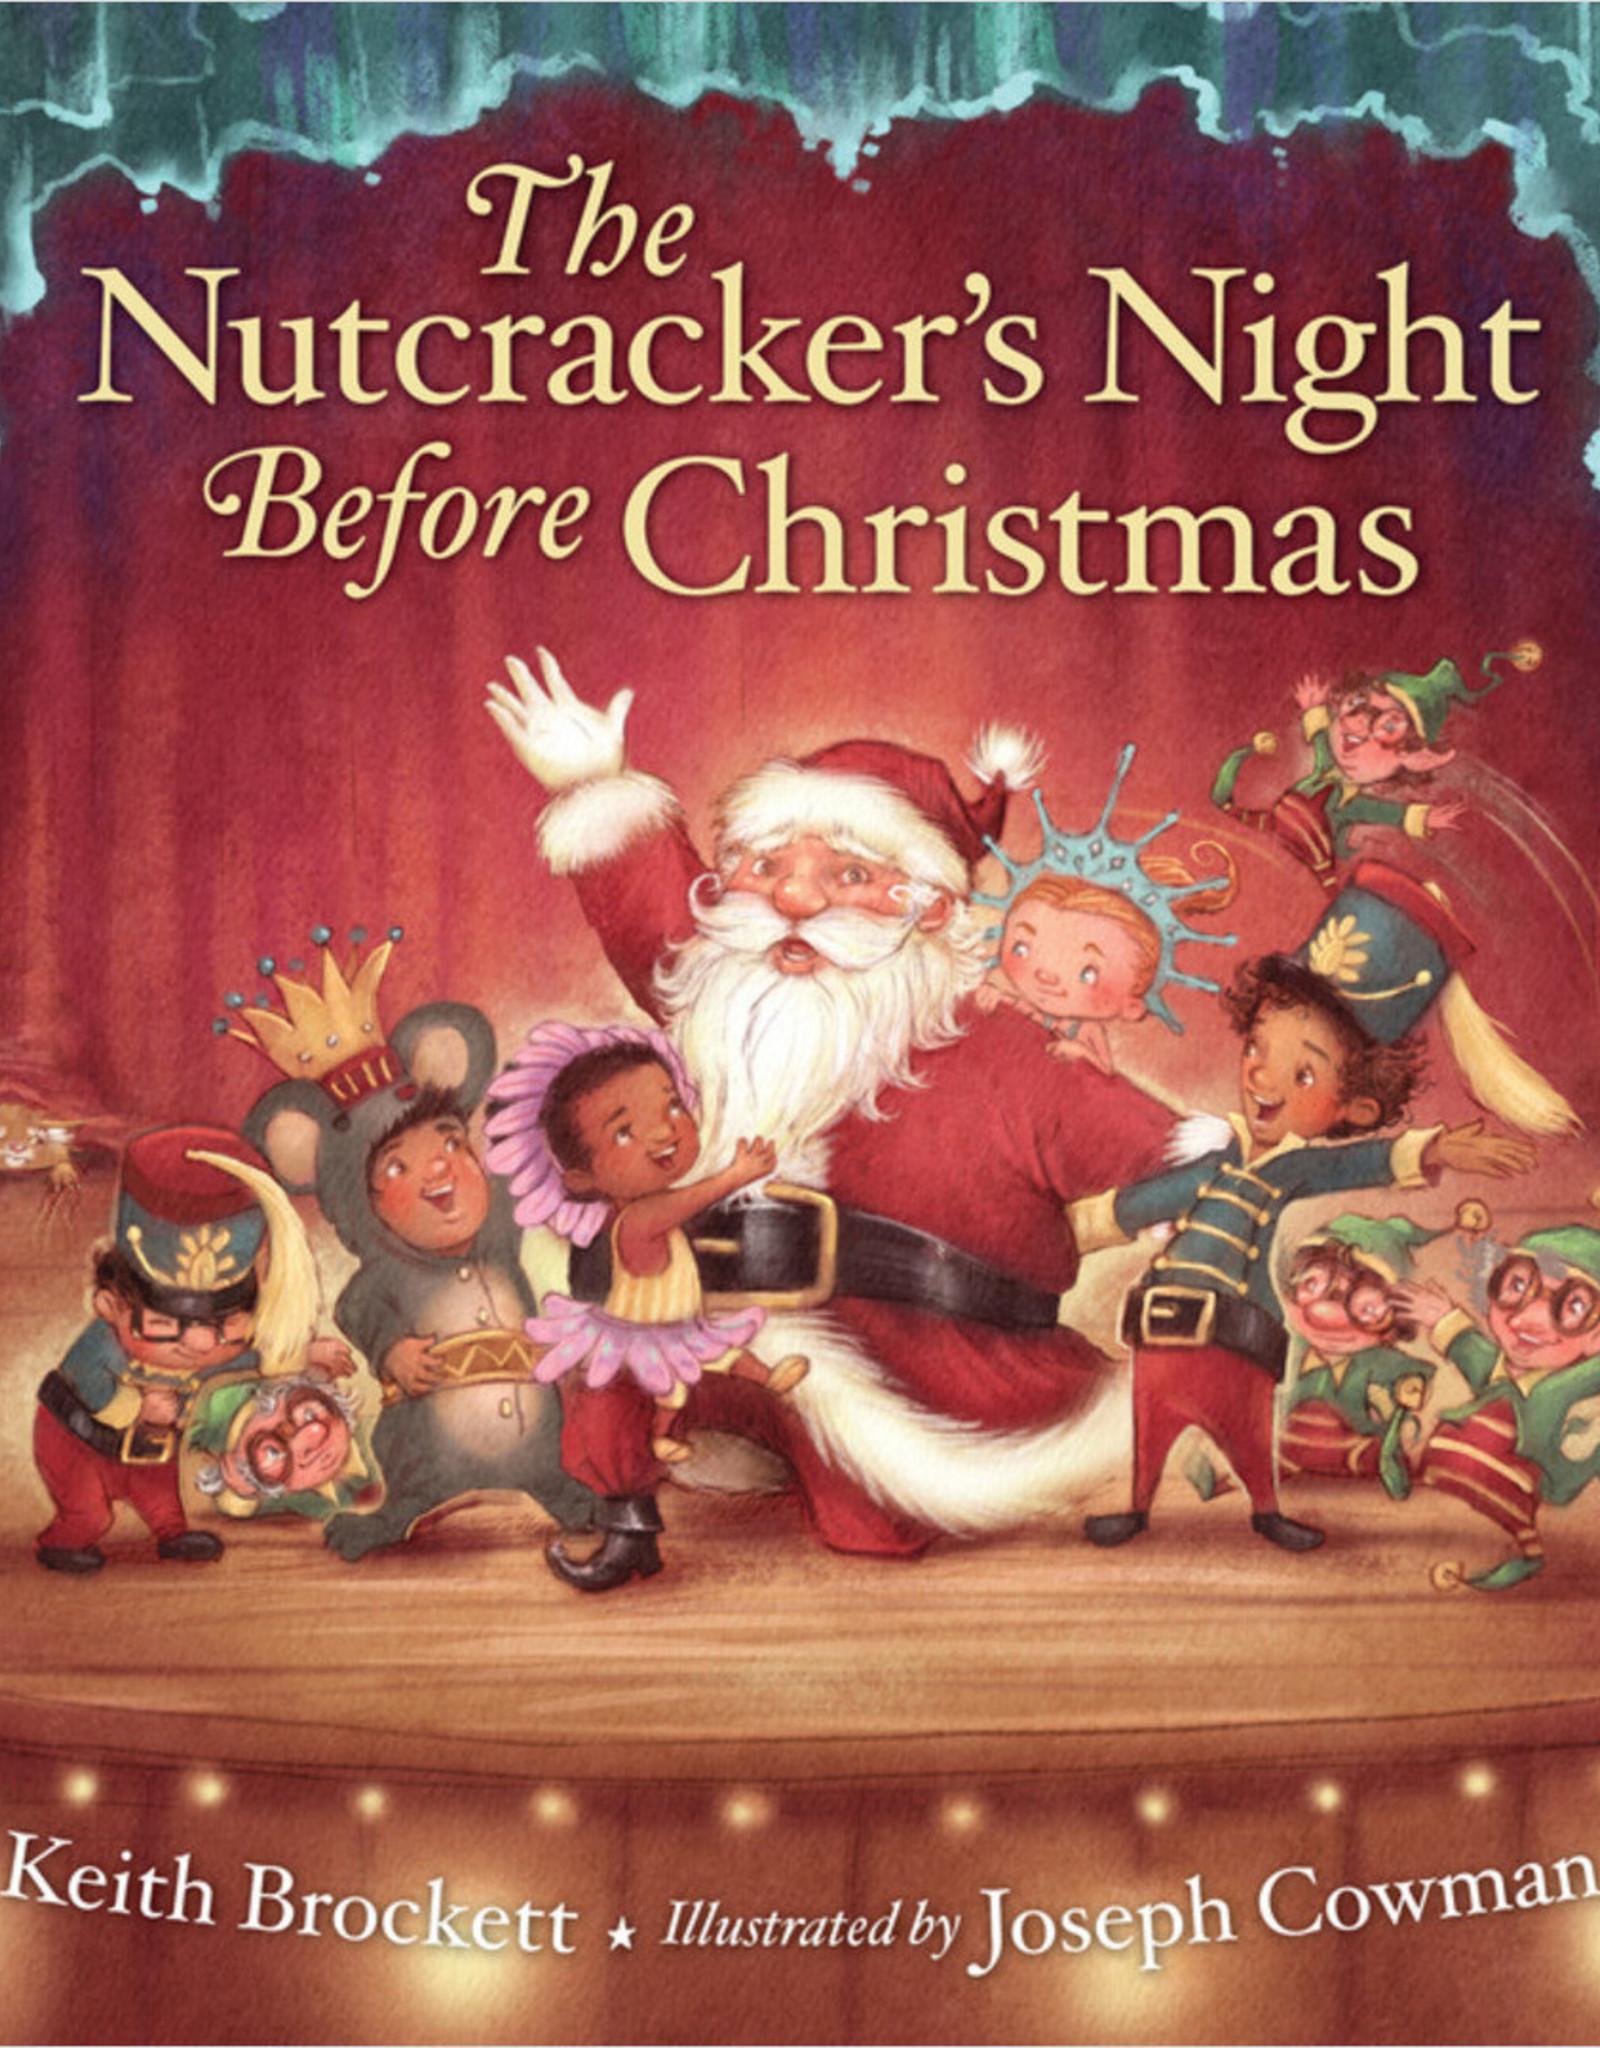 Sleeping Bear The Nutcracker's Night Before Christmas